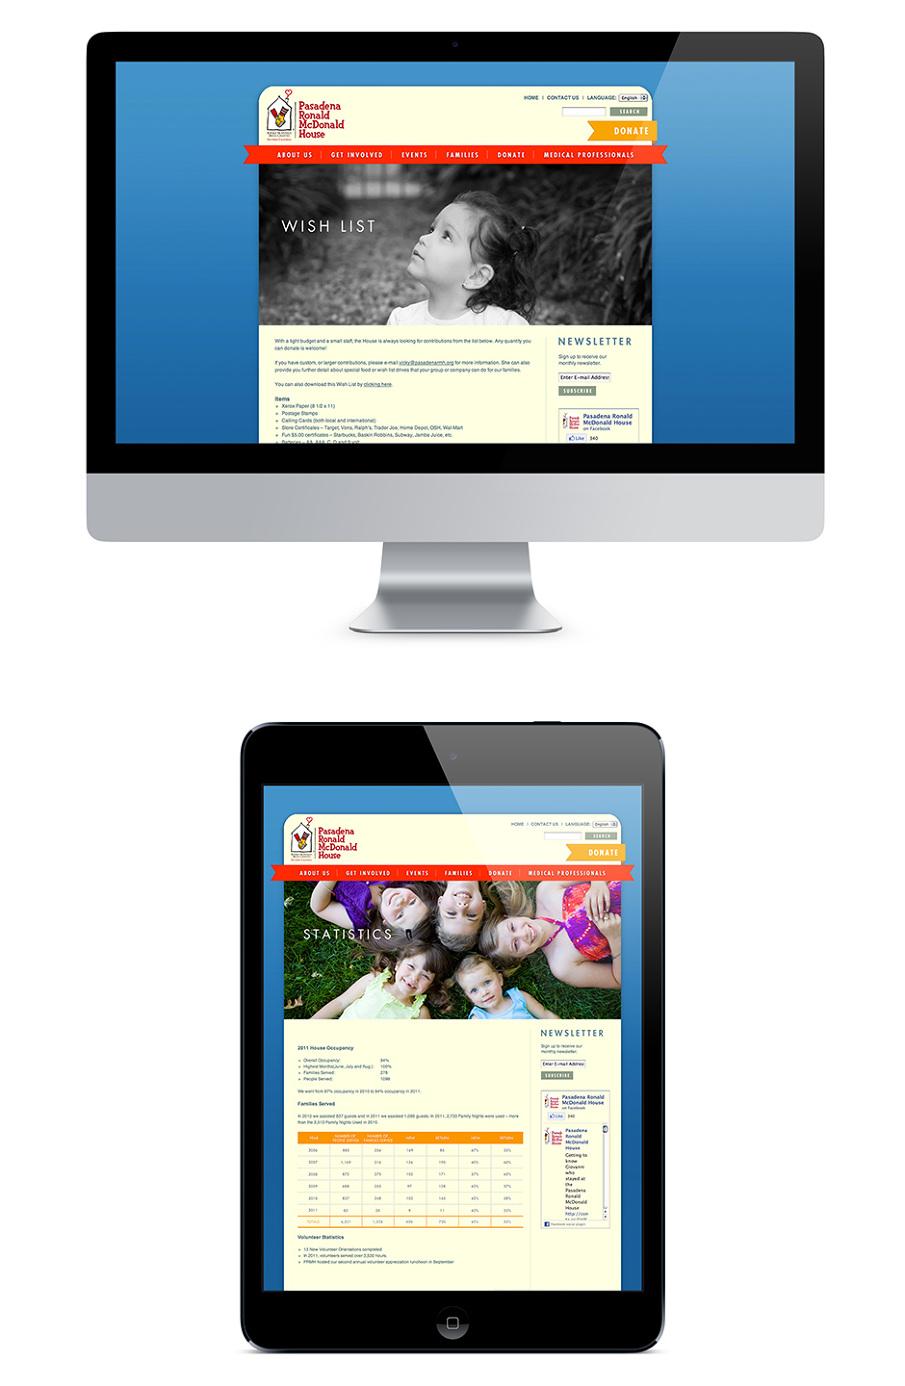 Mcdonald S Prmh Website Janson Kim